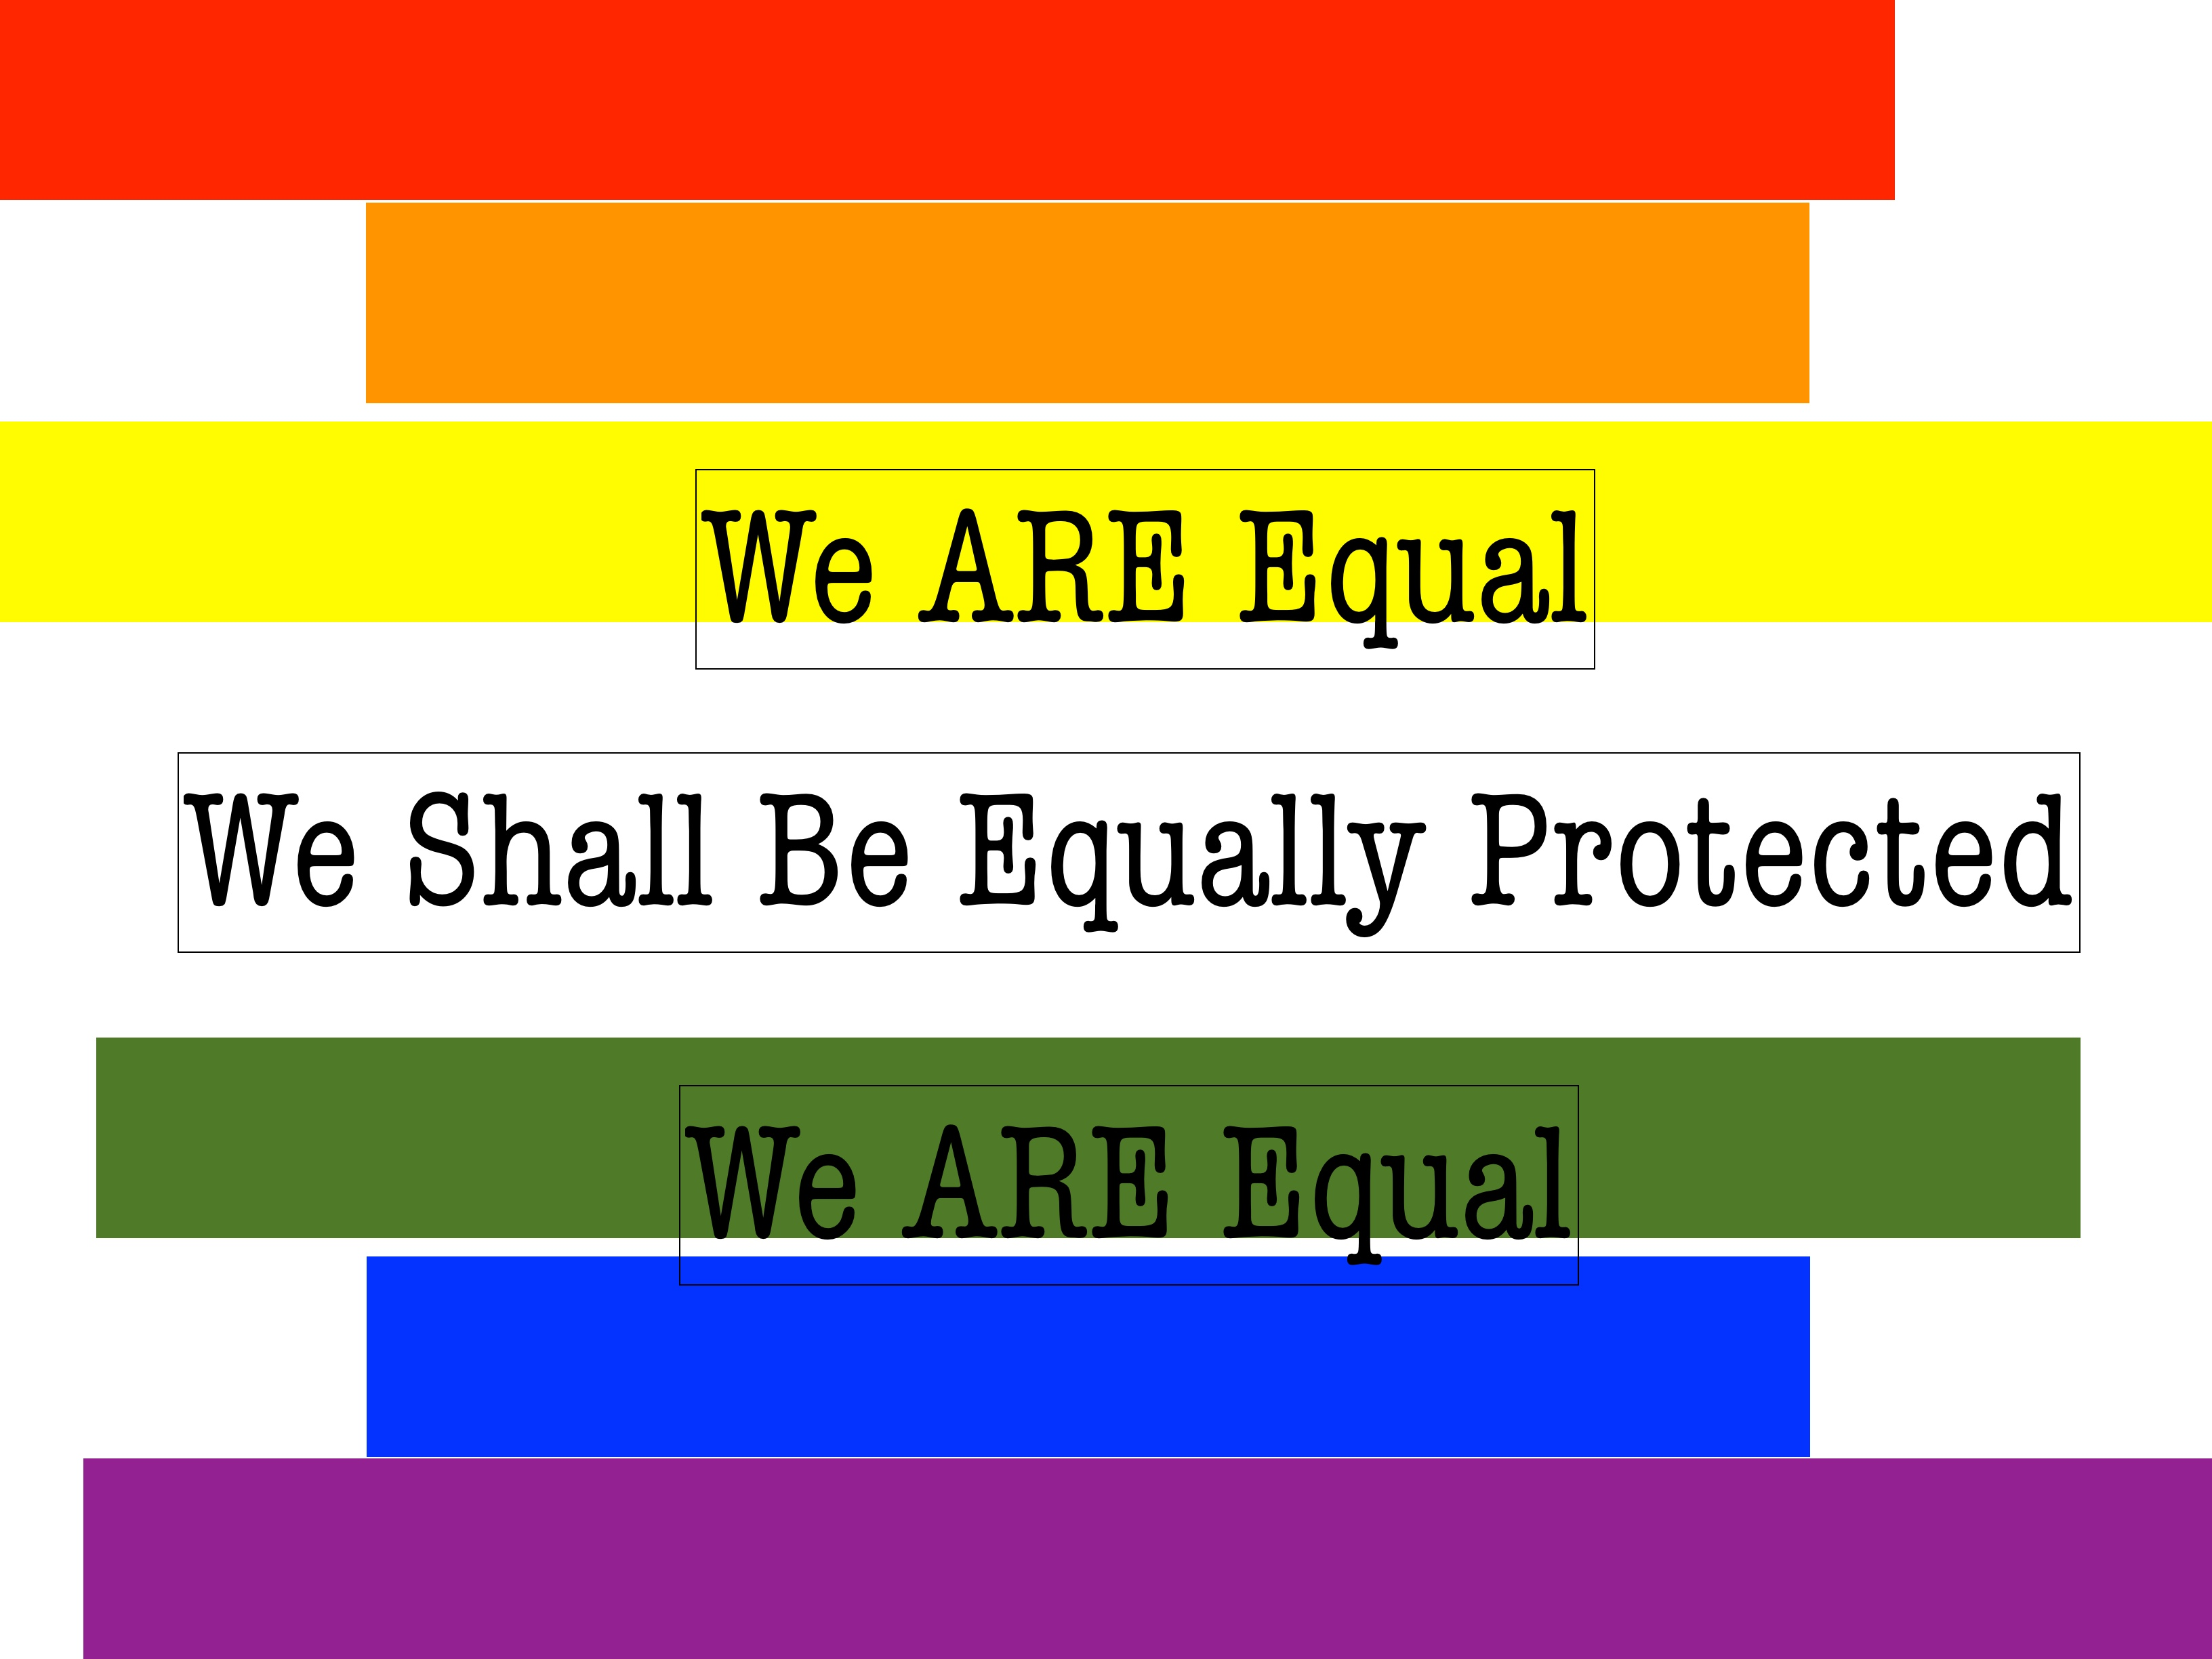 Workplace Equality 2020, Martin Haro